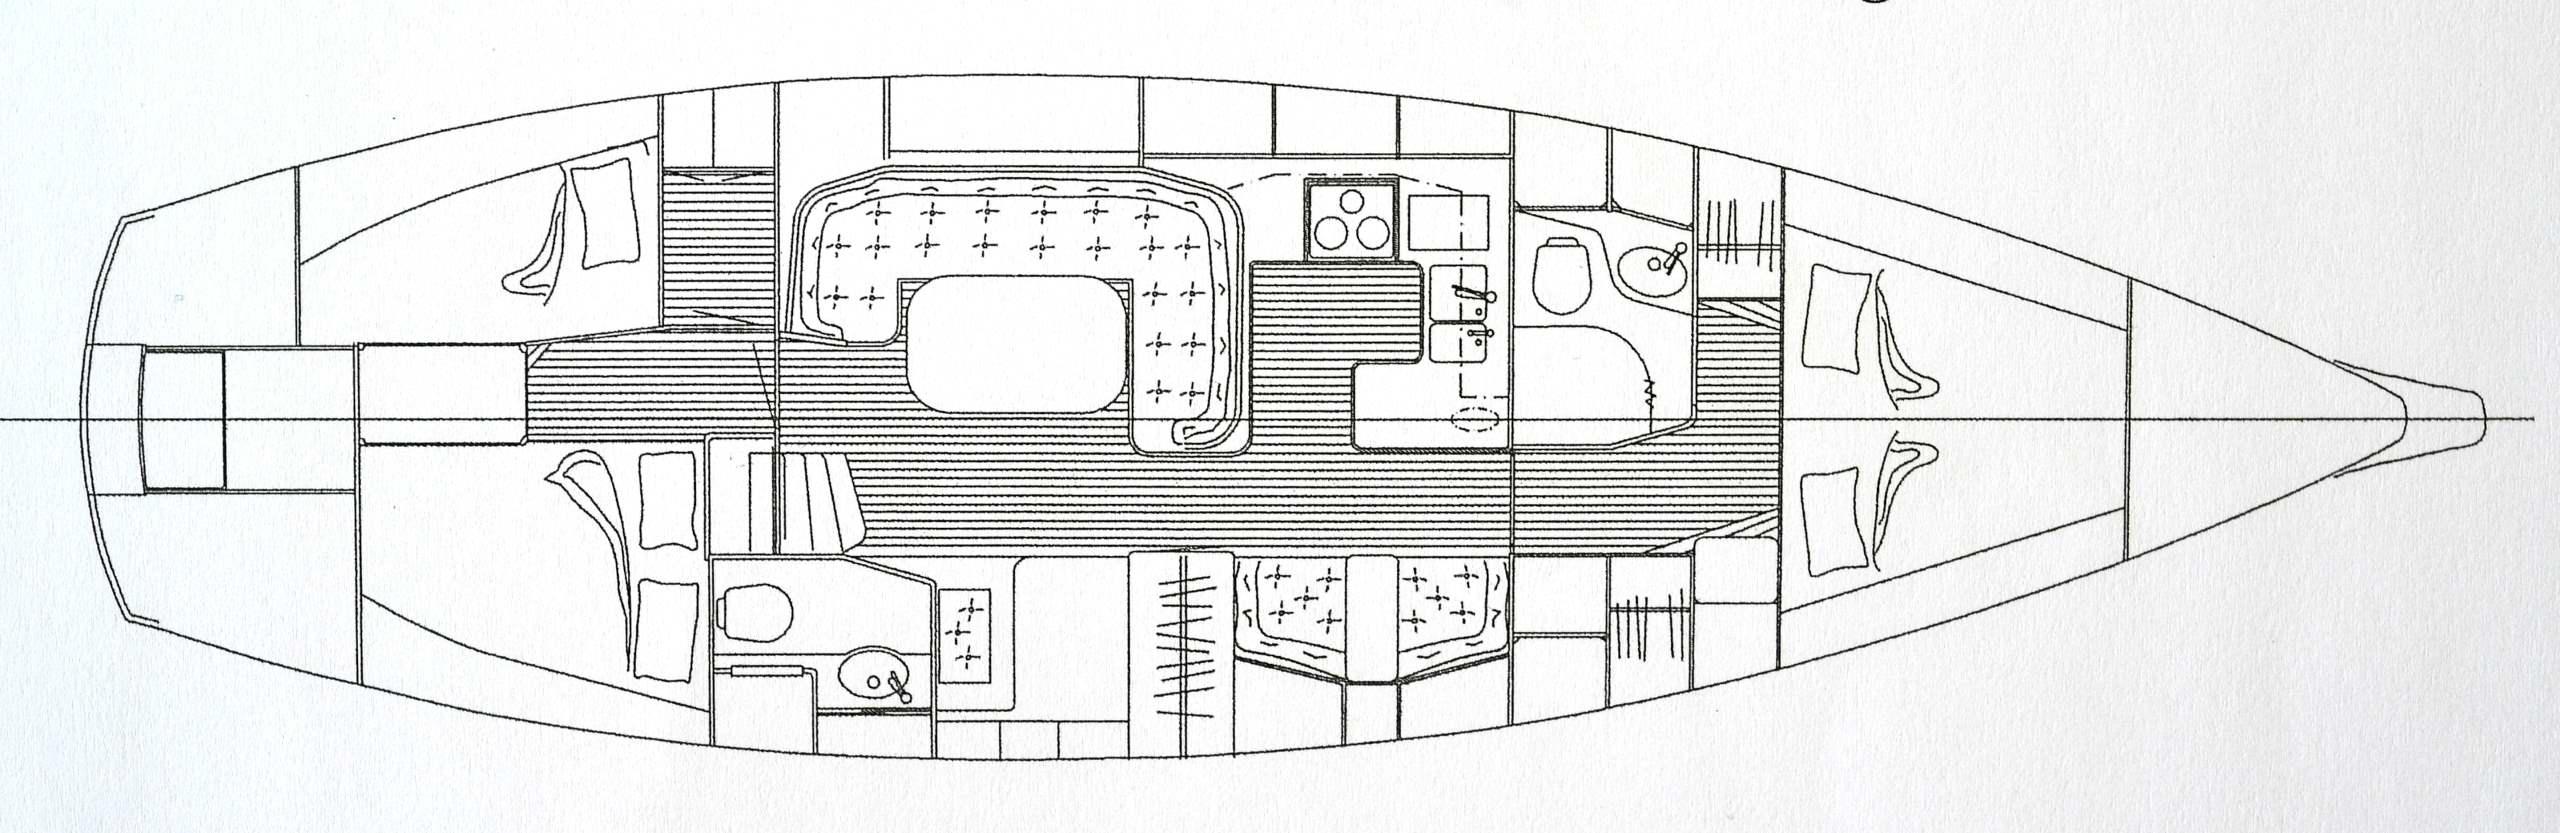 F44 Pilot House #20, Vindöga, General Arrangement